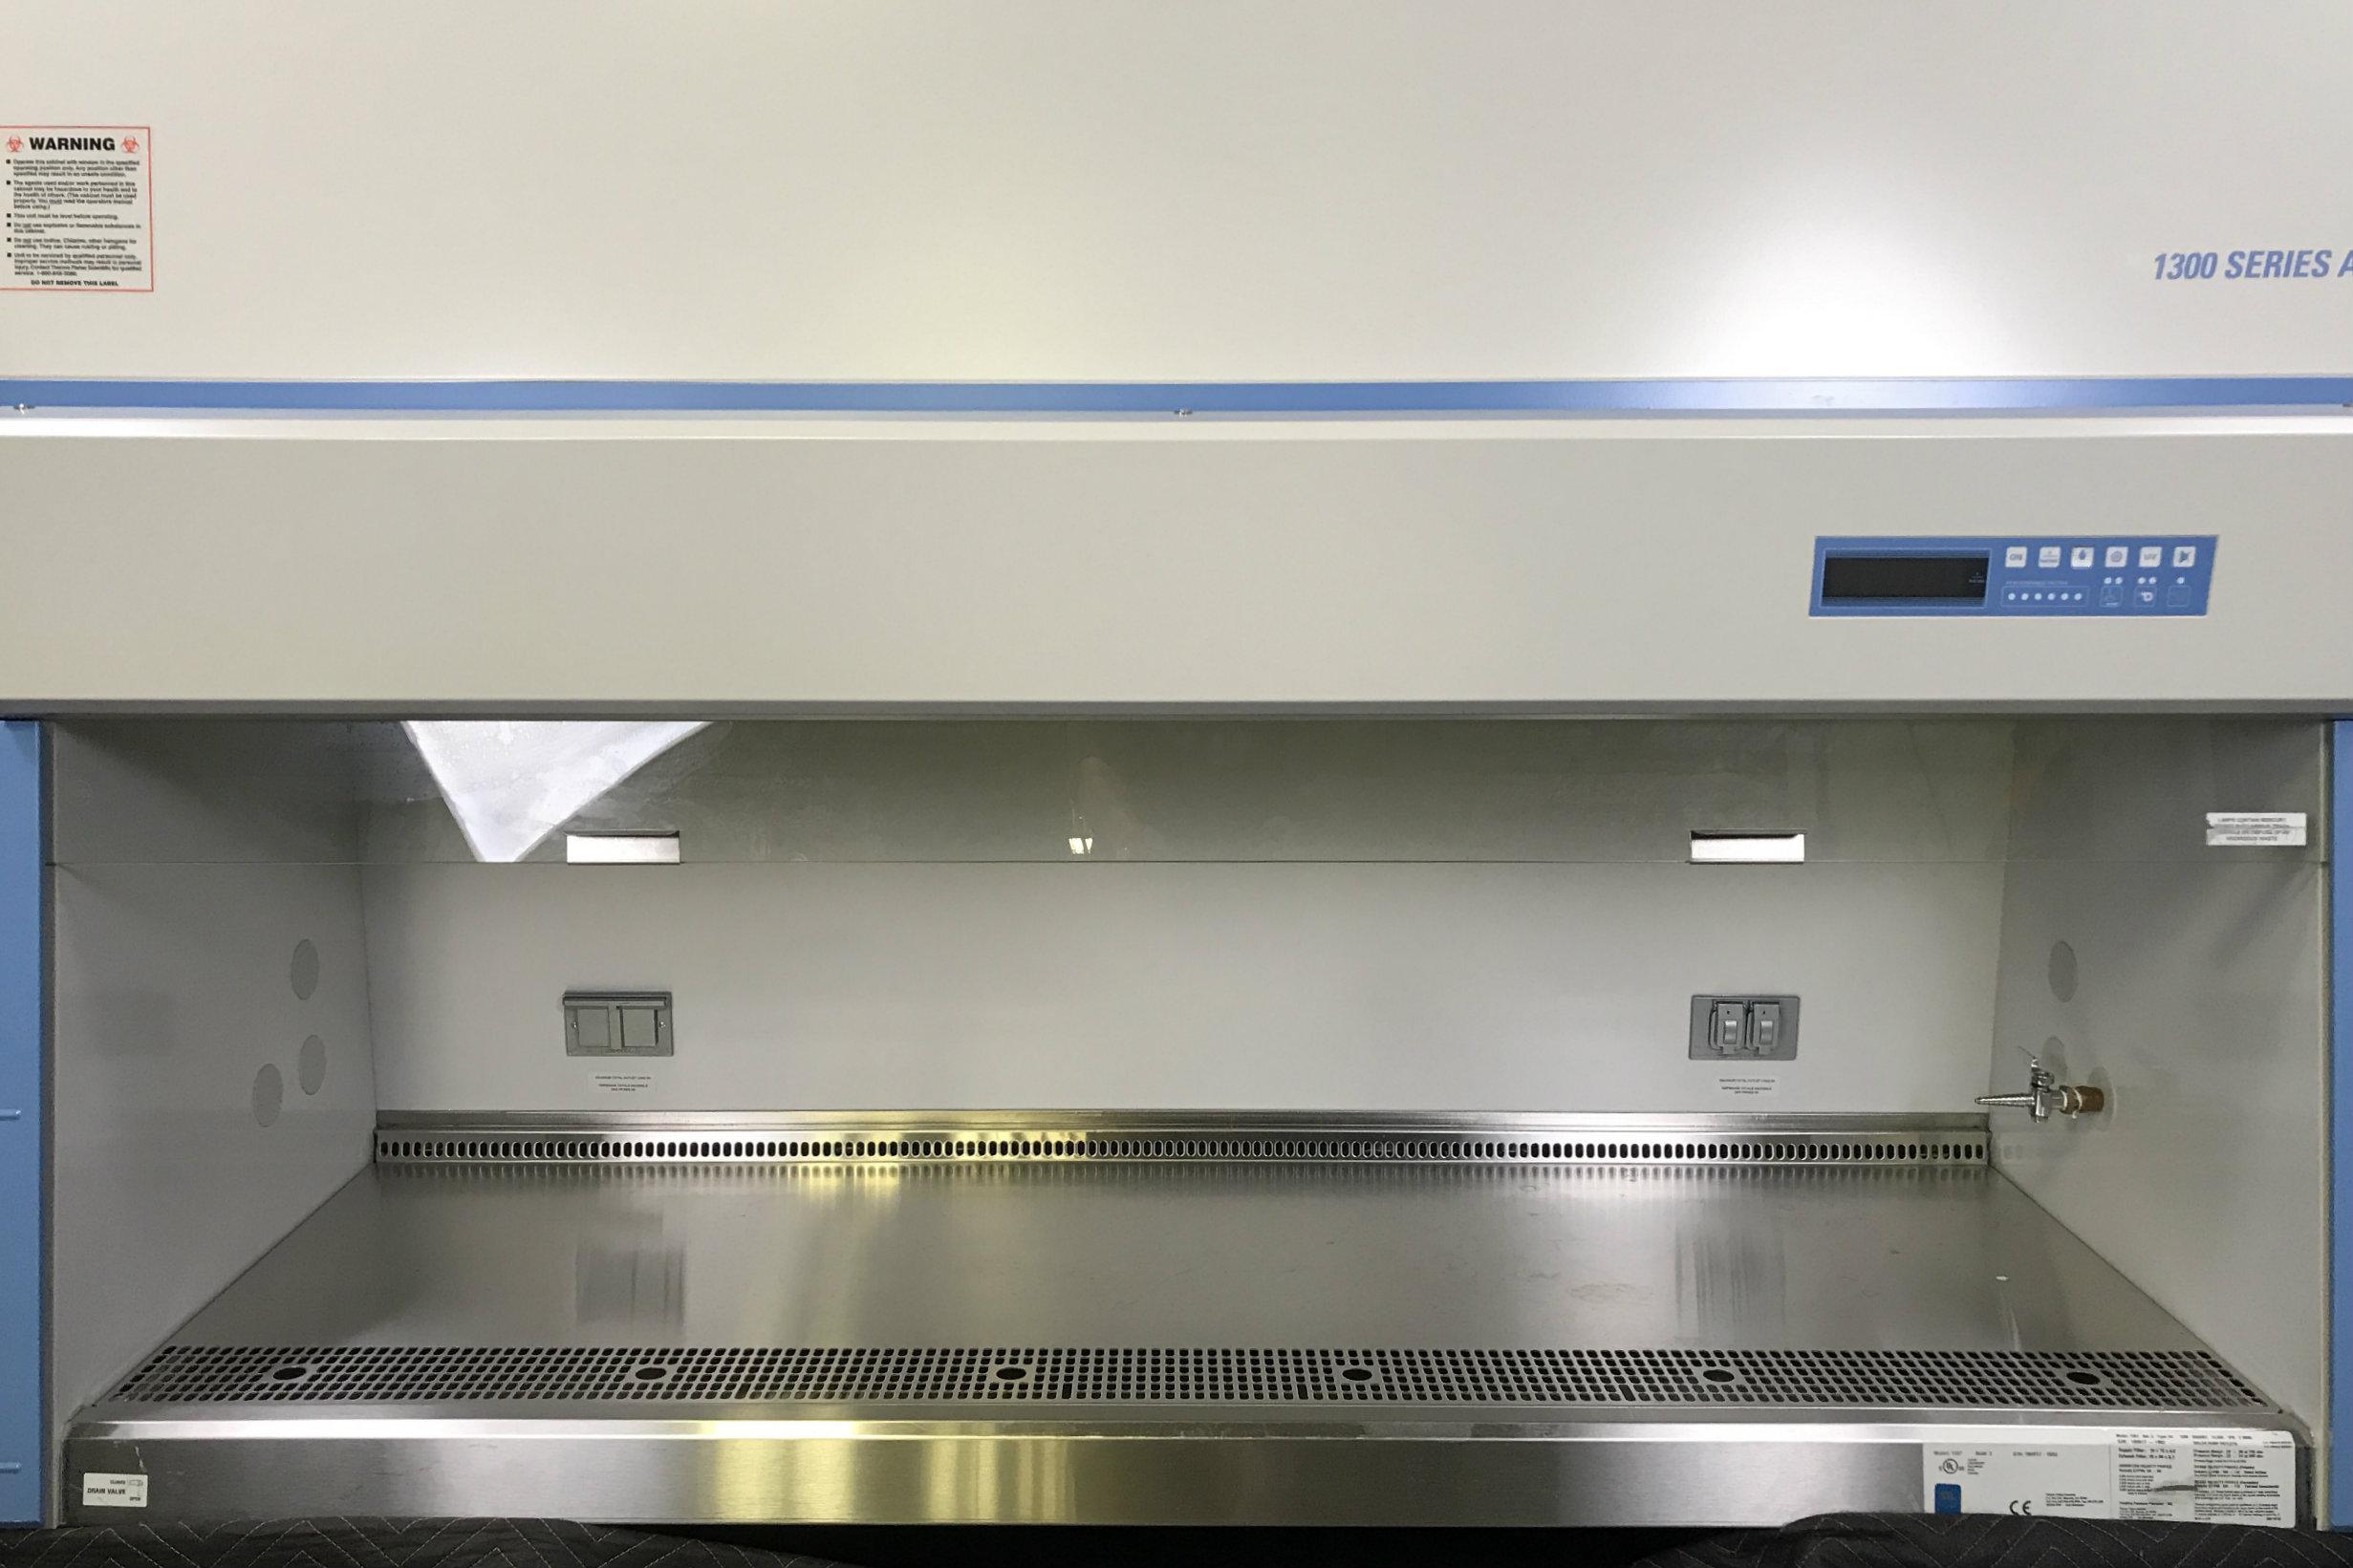 Refurbished Thermo Scientific 1300 Series Class Ii Type